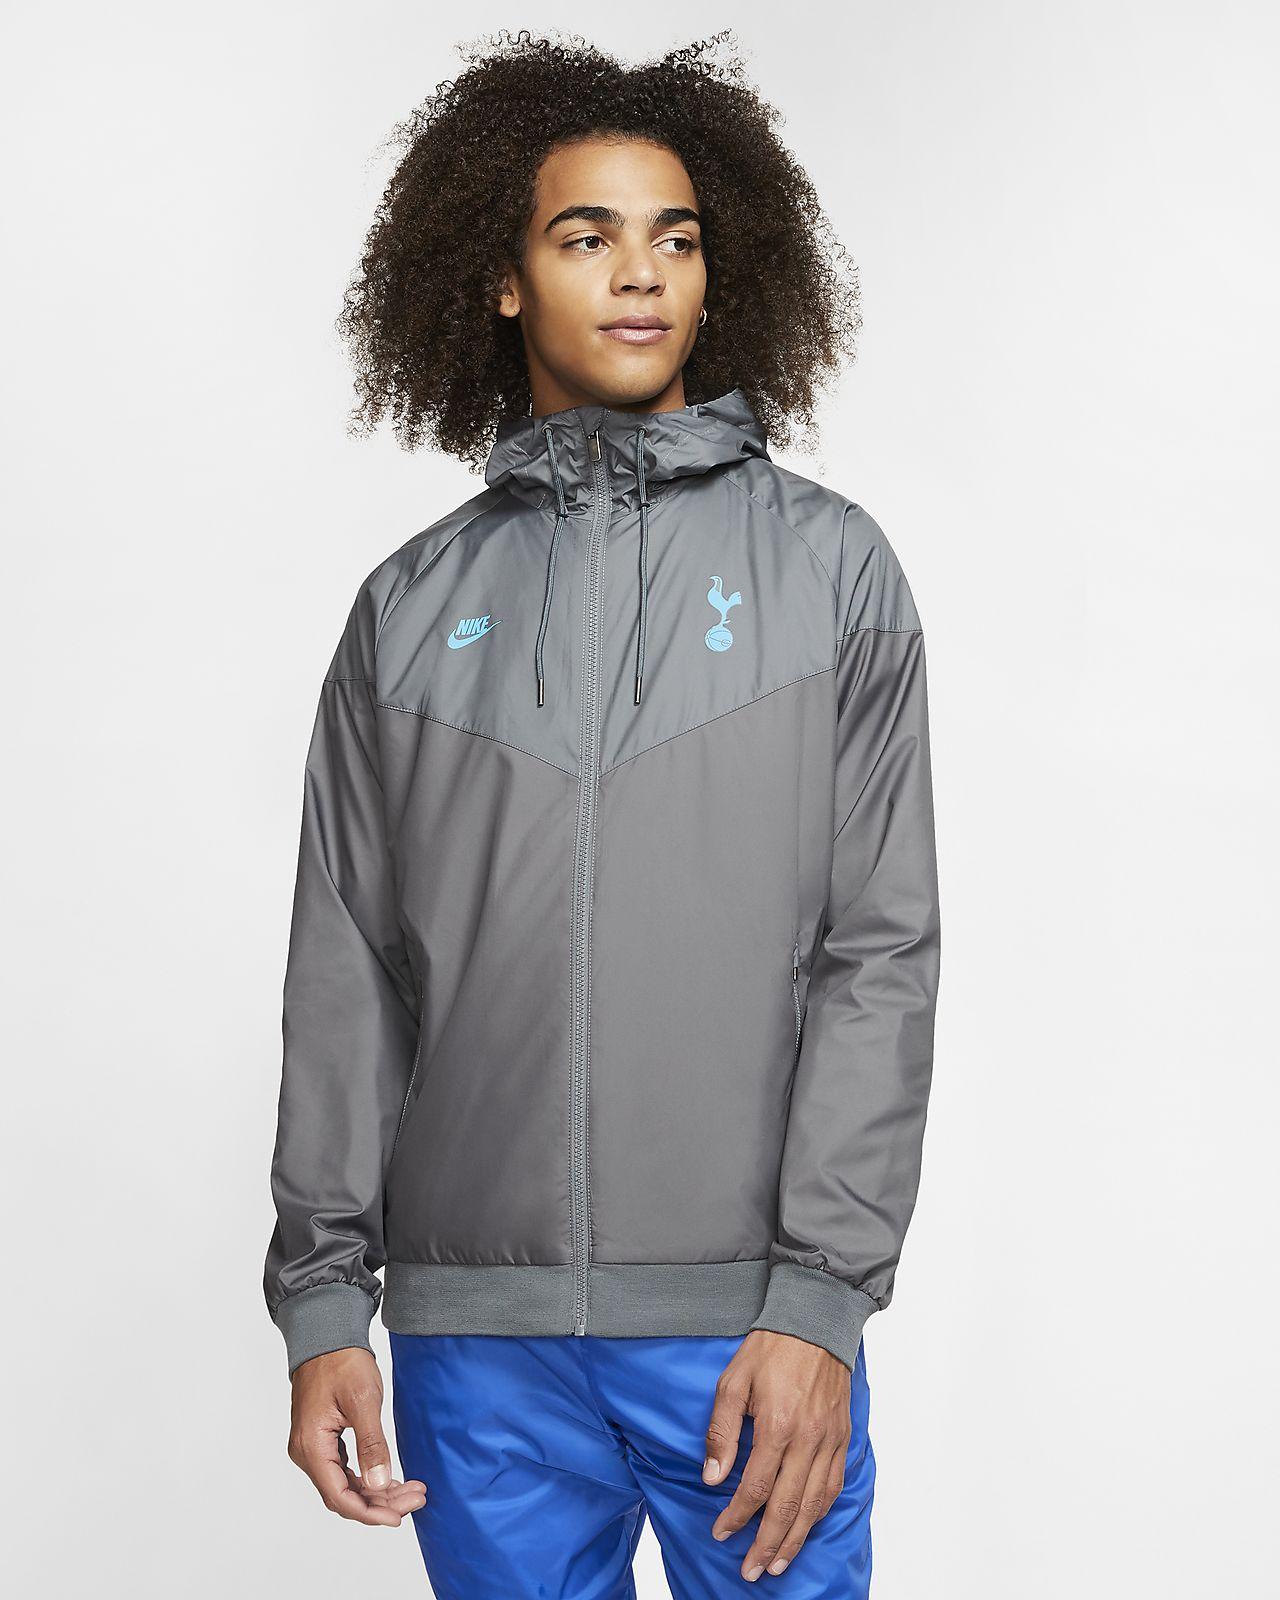 Tottenham Hotspur Windrunner Men's Jacket